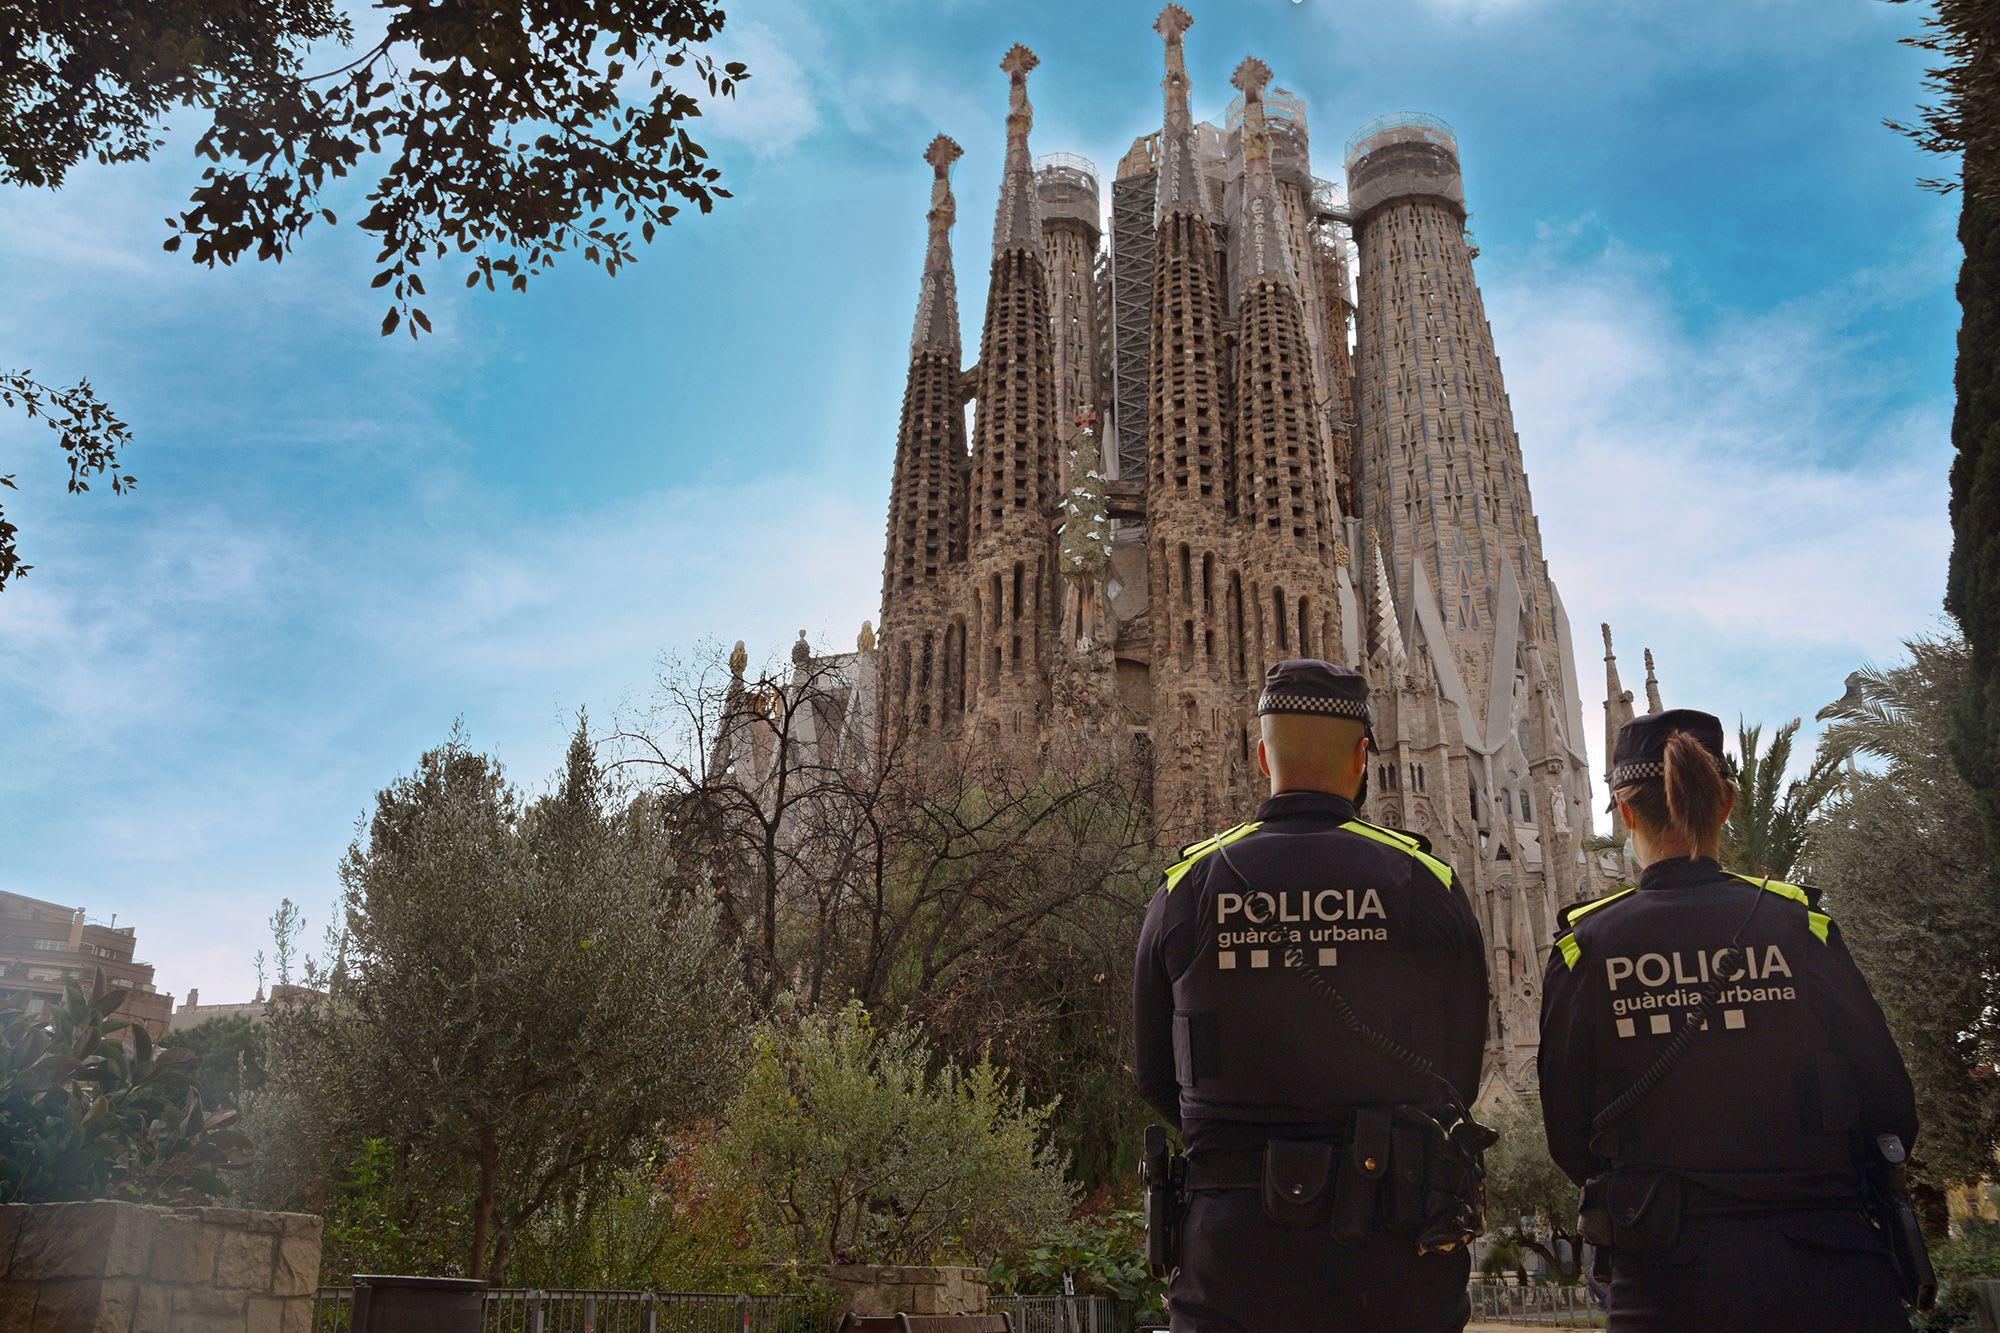 Curs Online Guàrdia Urbana Barcelona (Bloc 1, 2 i 3)